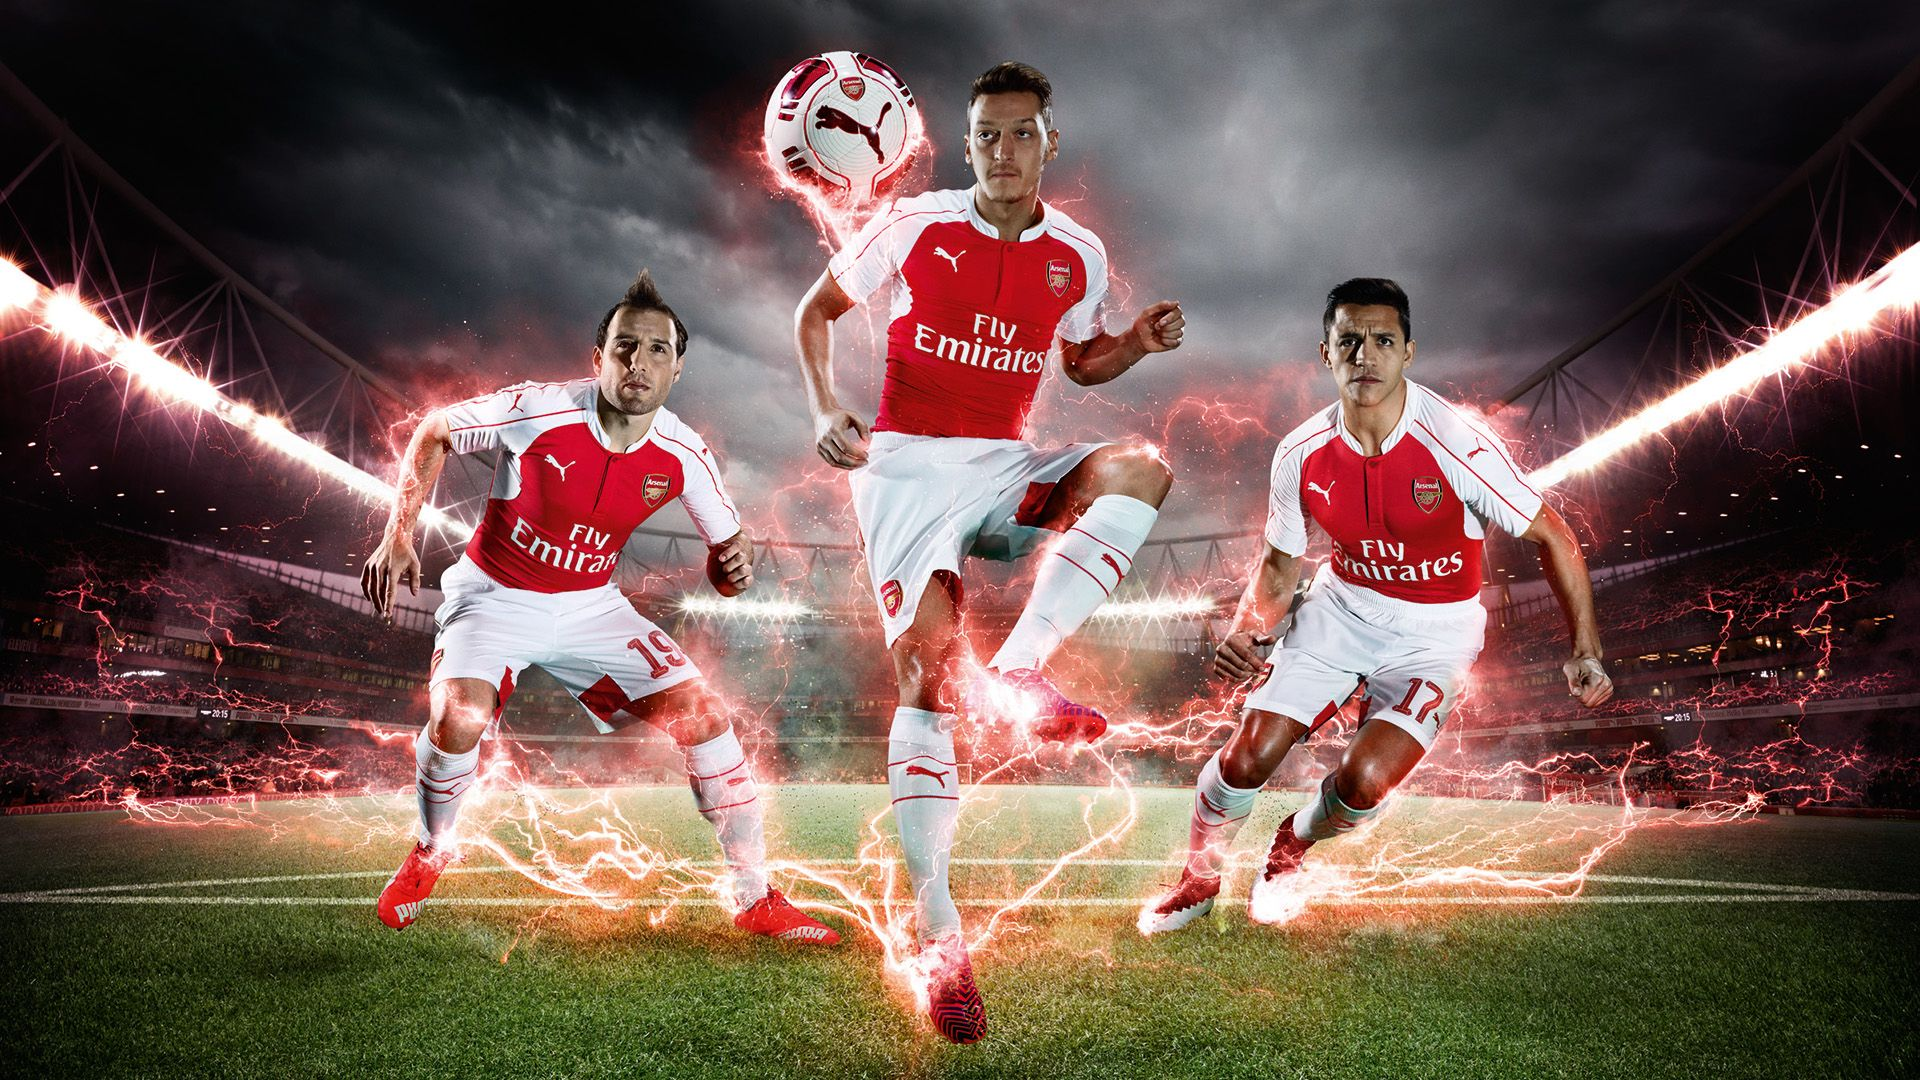 Mesut Ozil Wallpaper Hd Wallpapers Backgrounds Images Art Photos Arsenal Football Images Arsenal Football Shirt